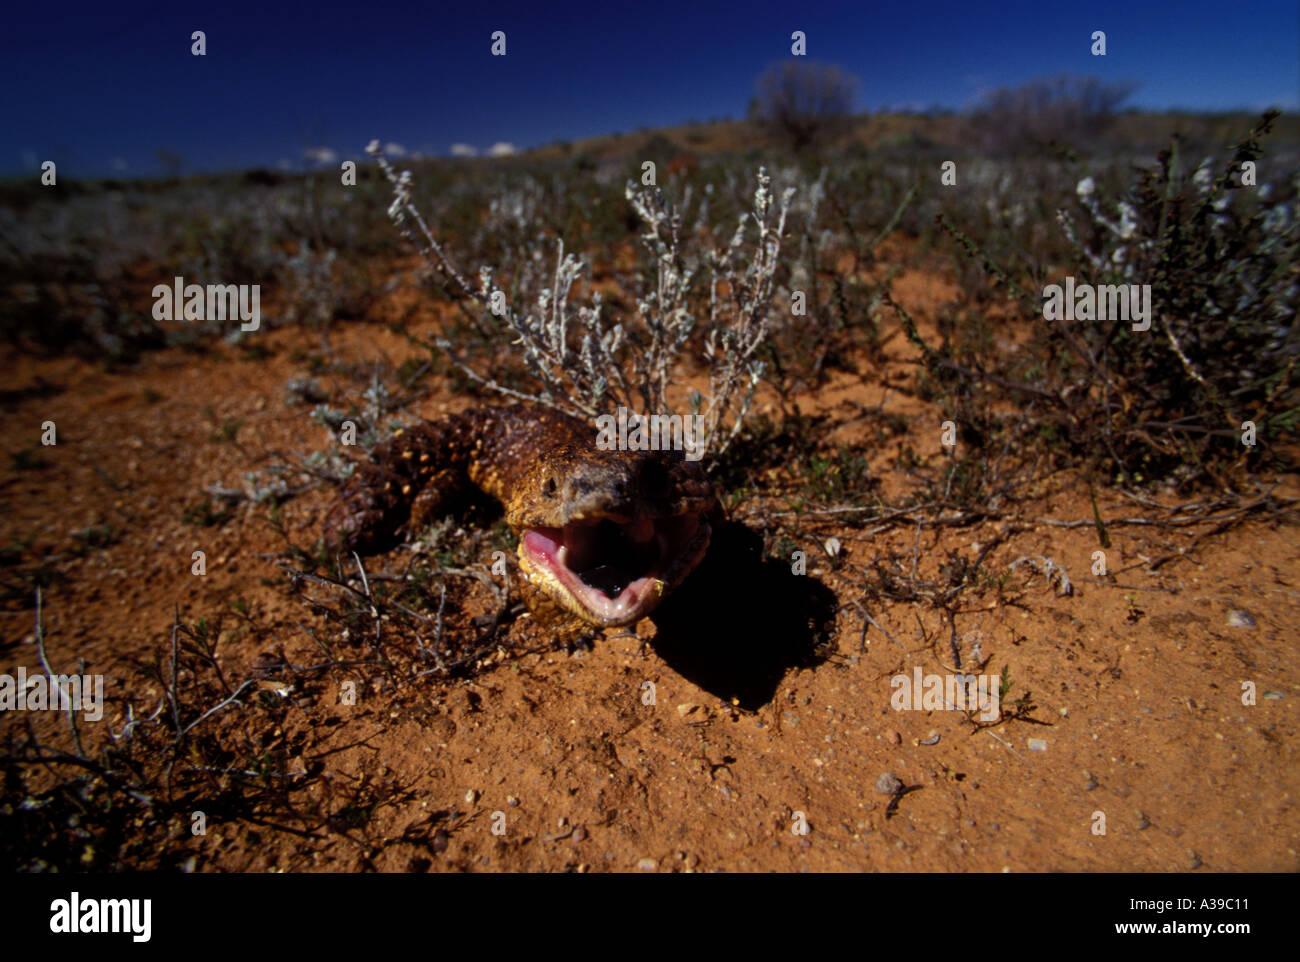 Shingle Back Blue Tounge Lizard 0254 - Stock Image